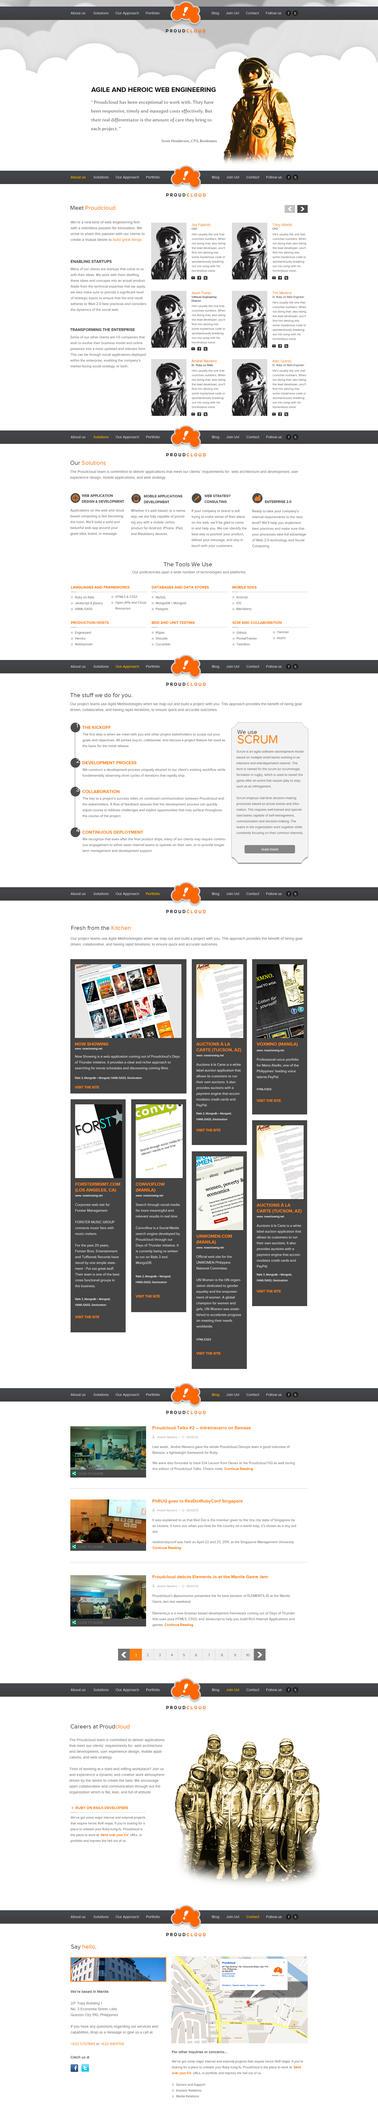 Proudcloud Website version 2 by Geobarney